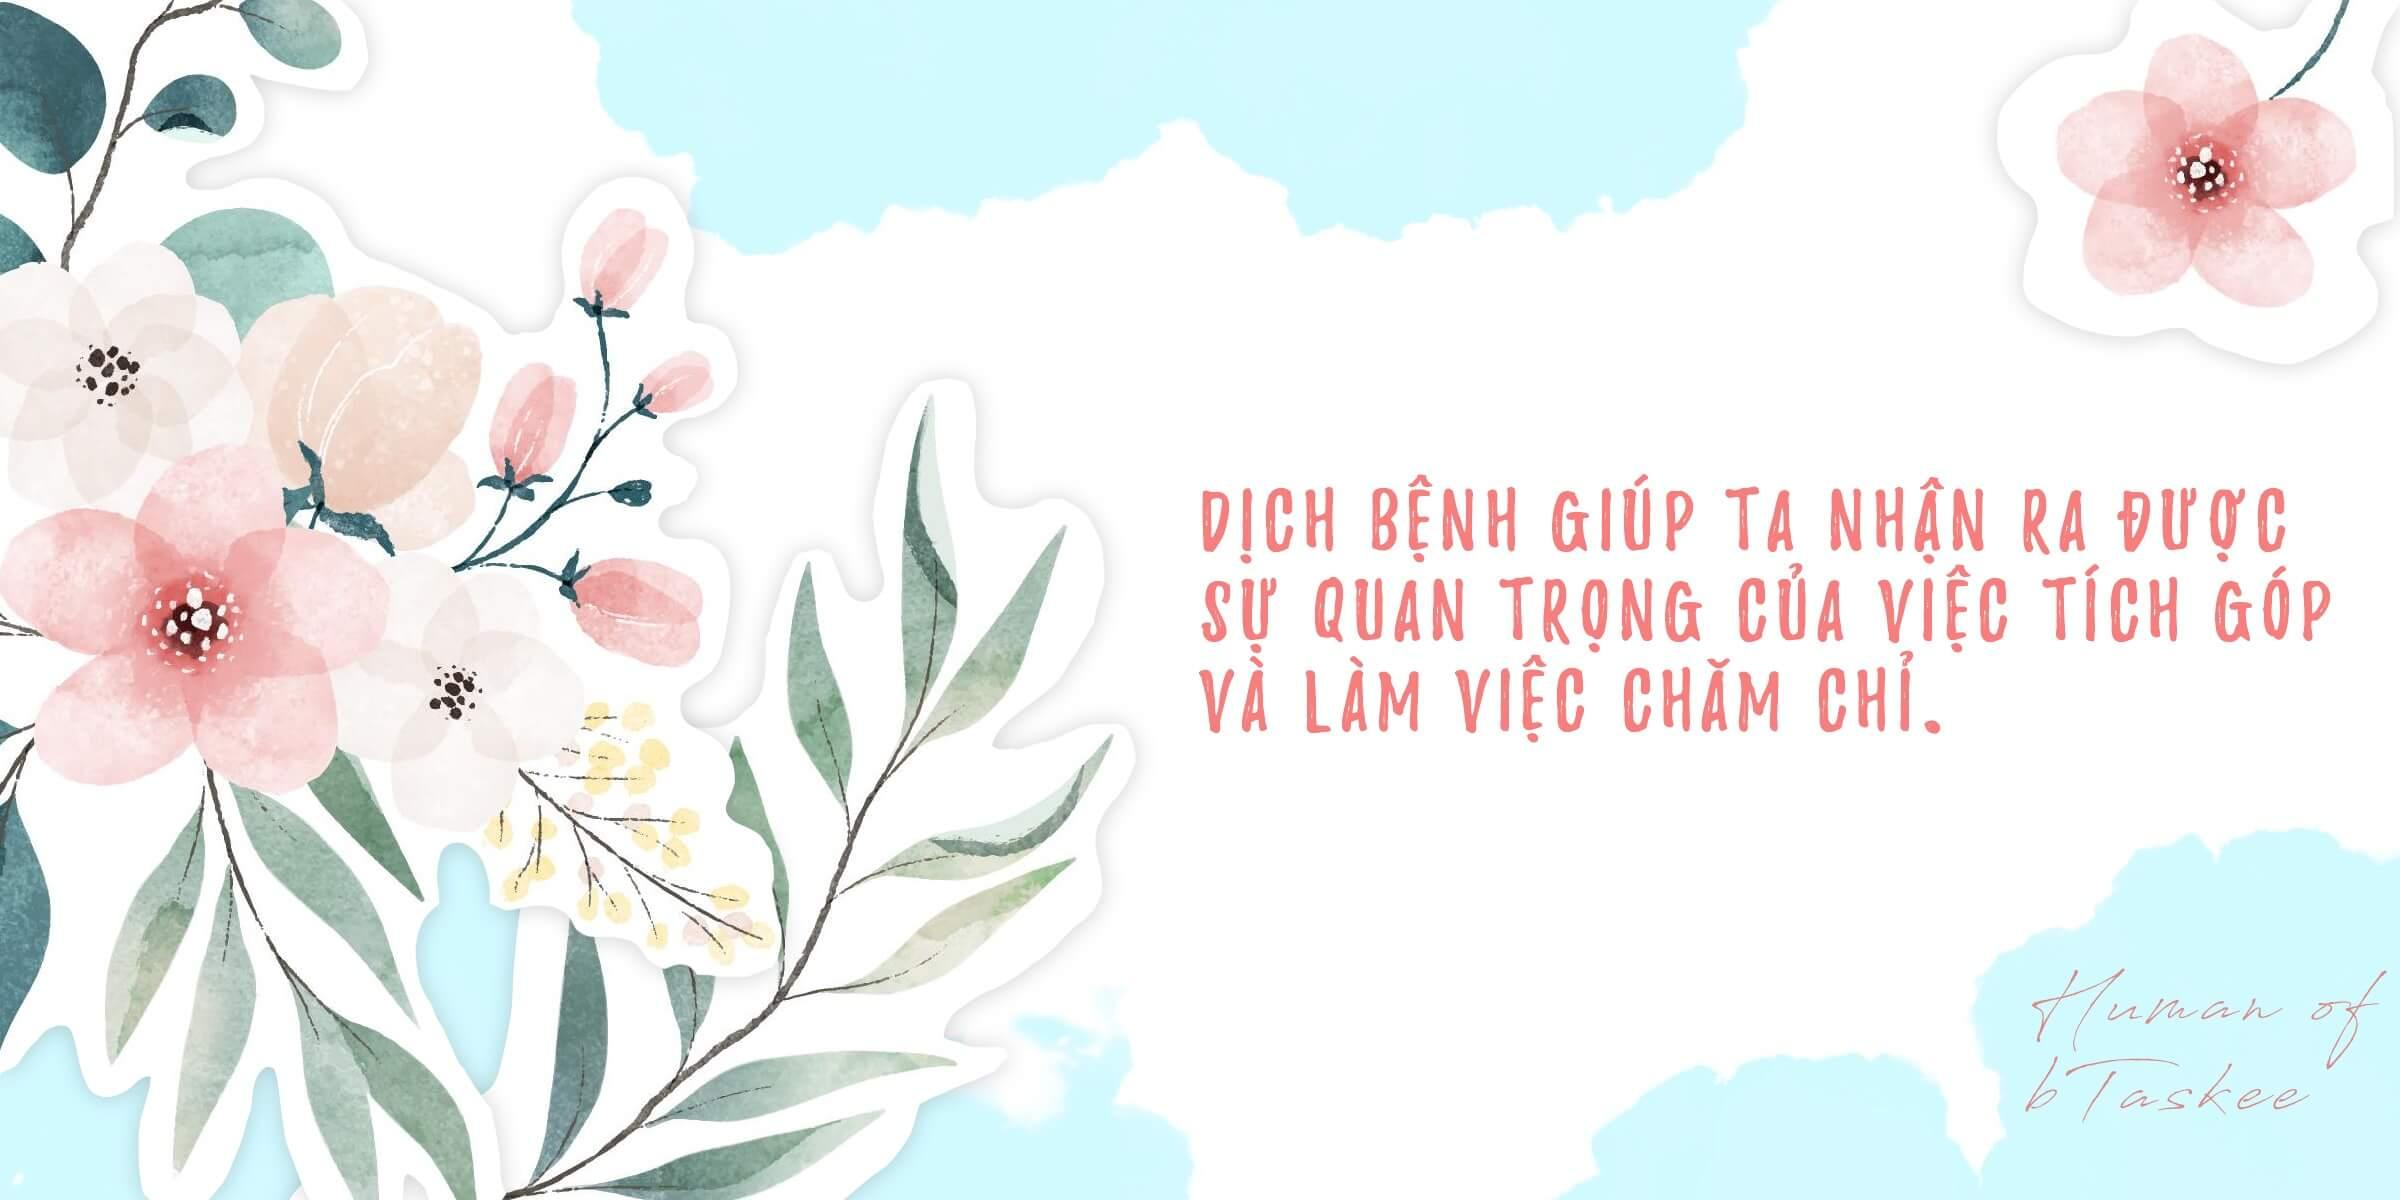 header-nguyen-thi-phuong-210928